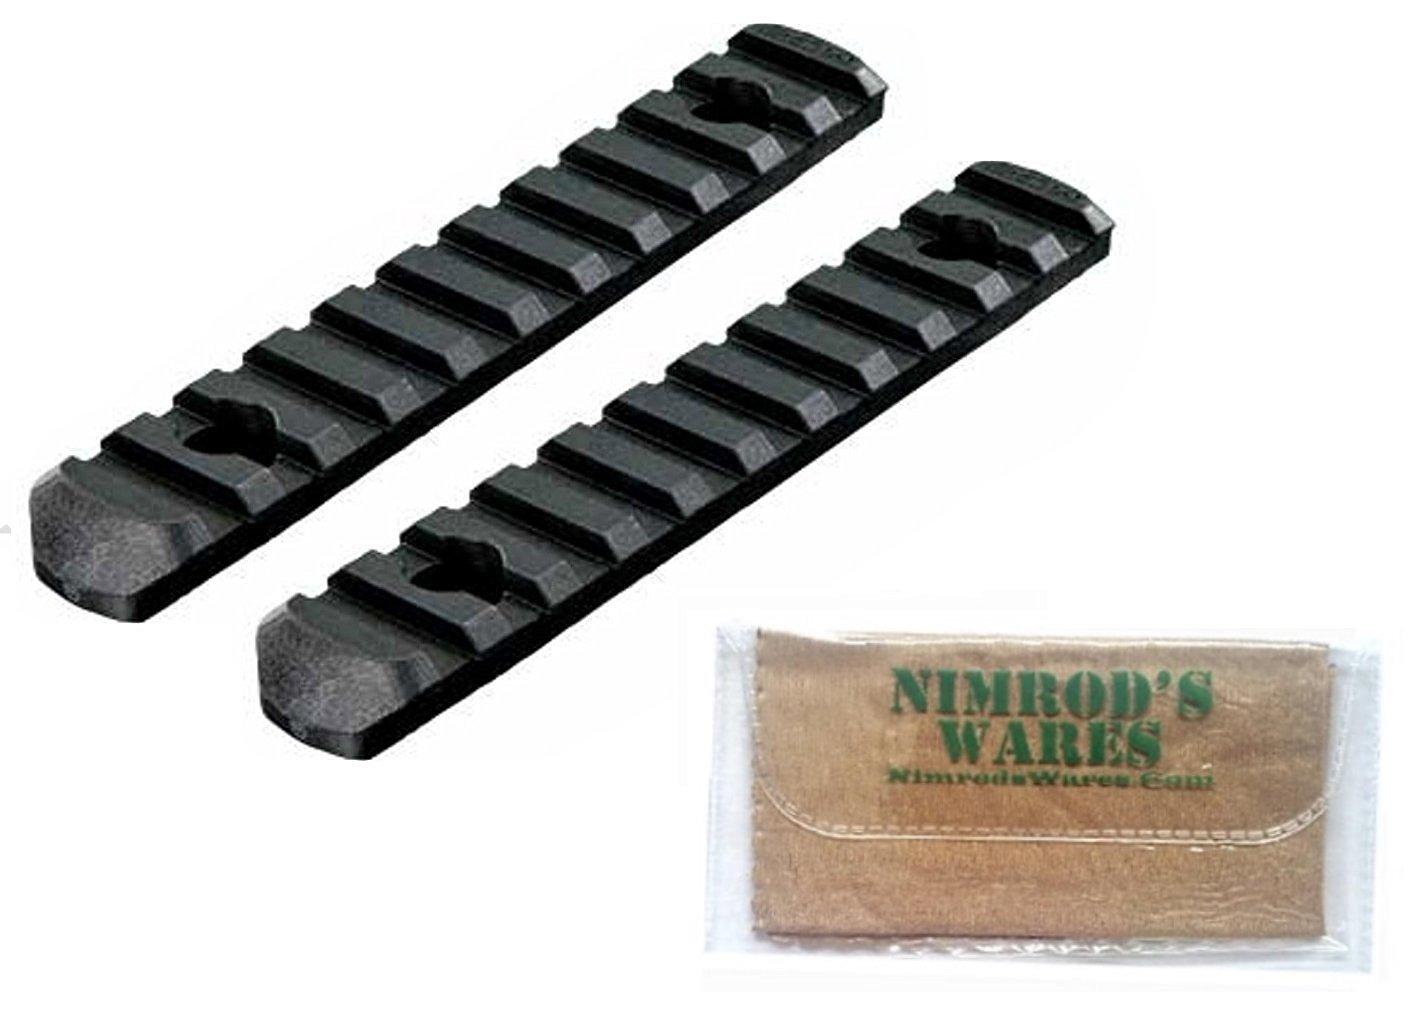 2-PACK MAGPUL MOE Polymer Rail Sections 11-Slots (L5) MAG409-BLK + Nimrod's Wares Microfiber Cloth